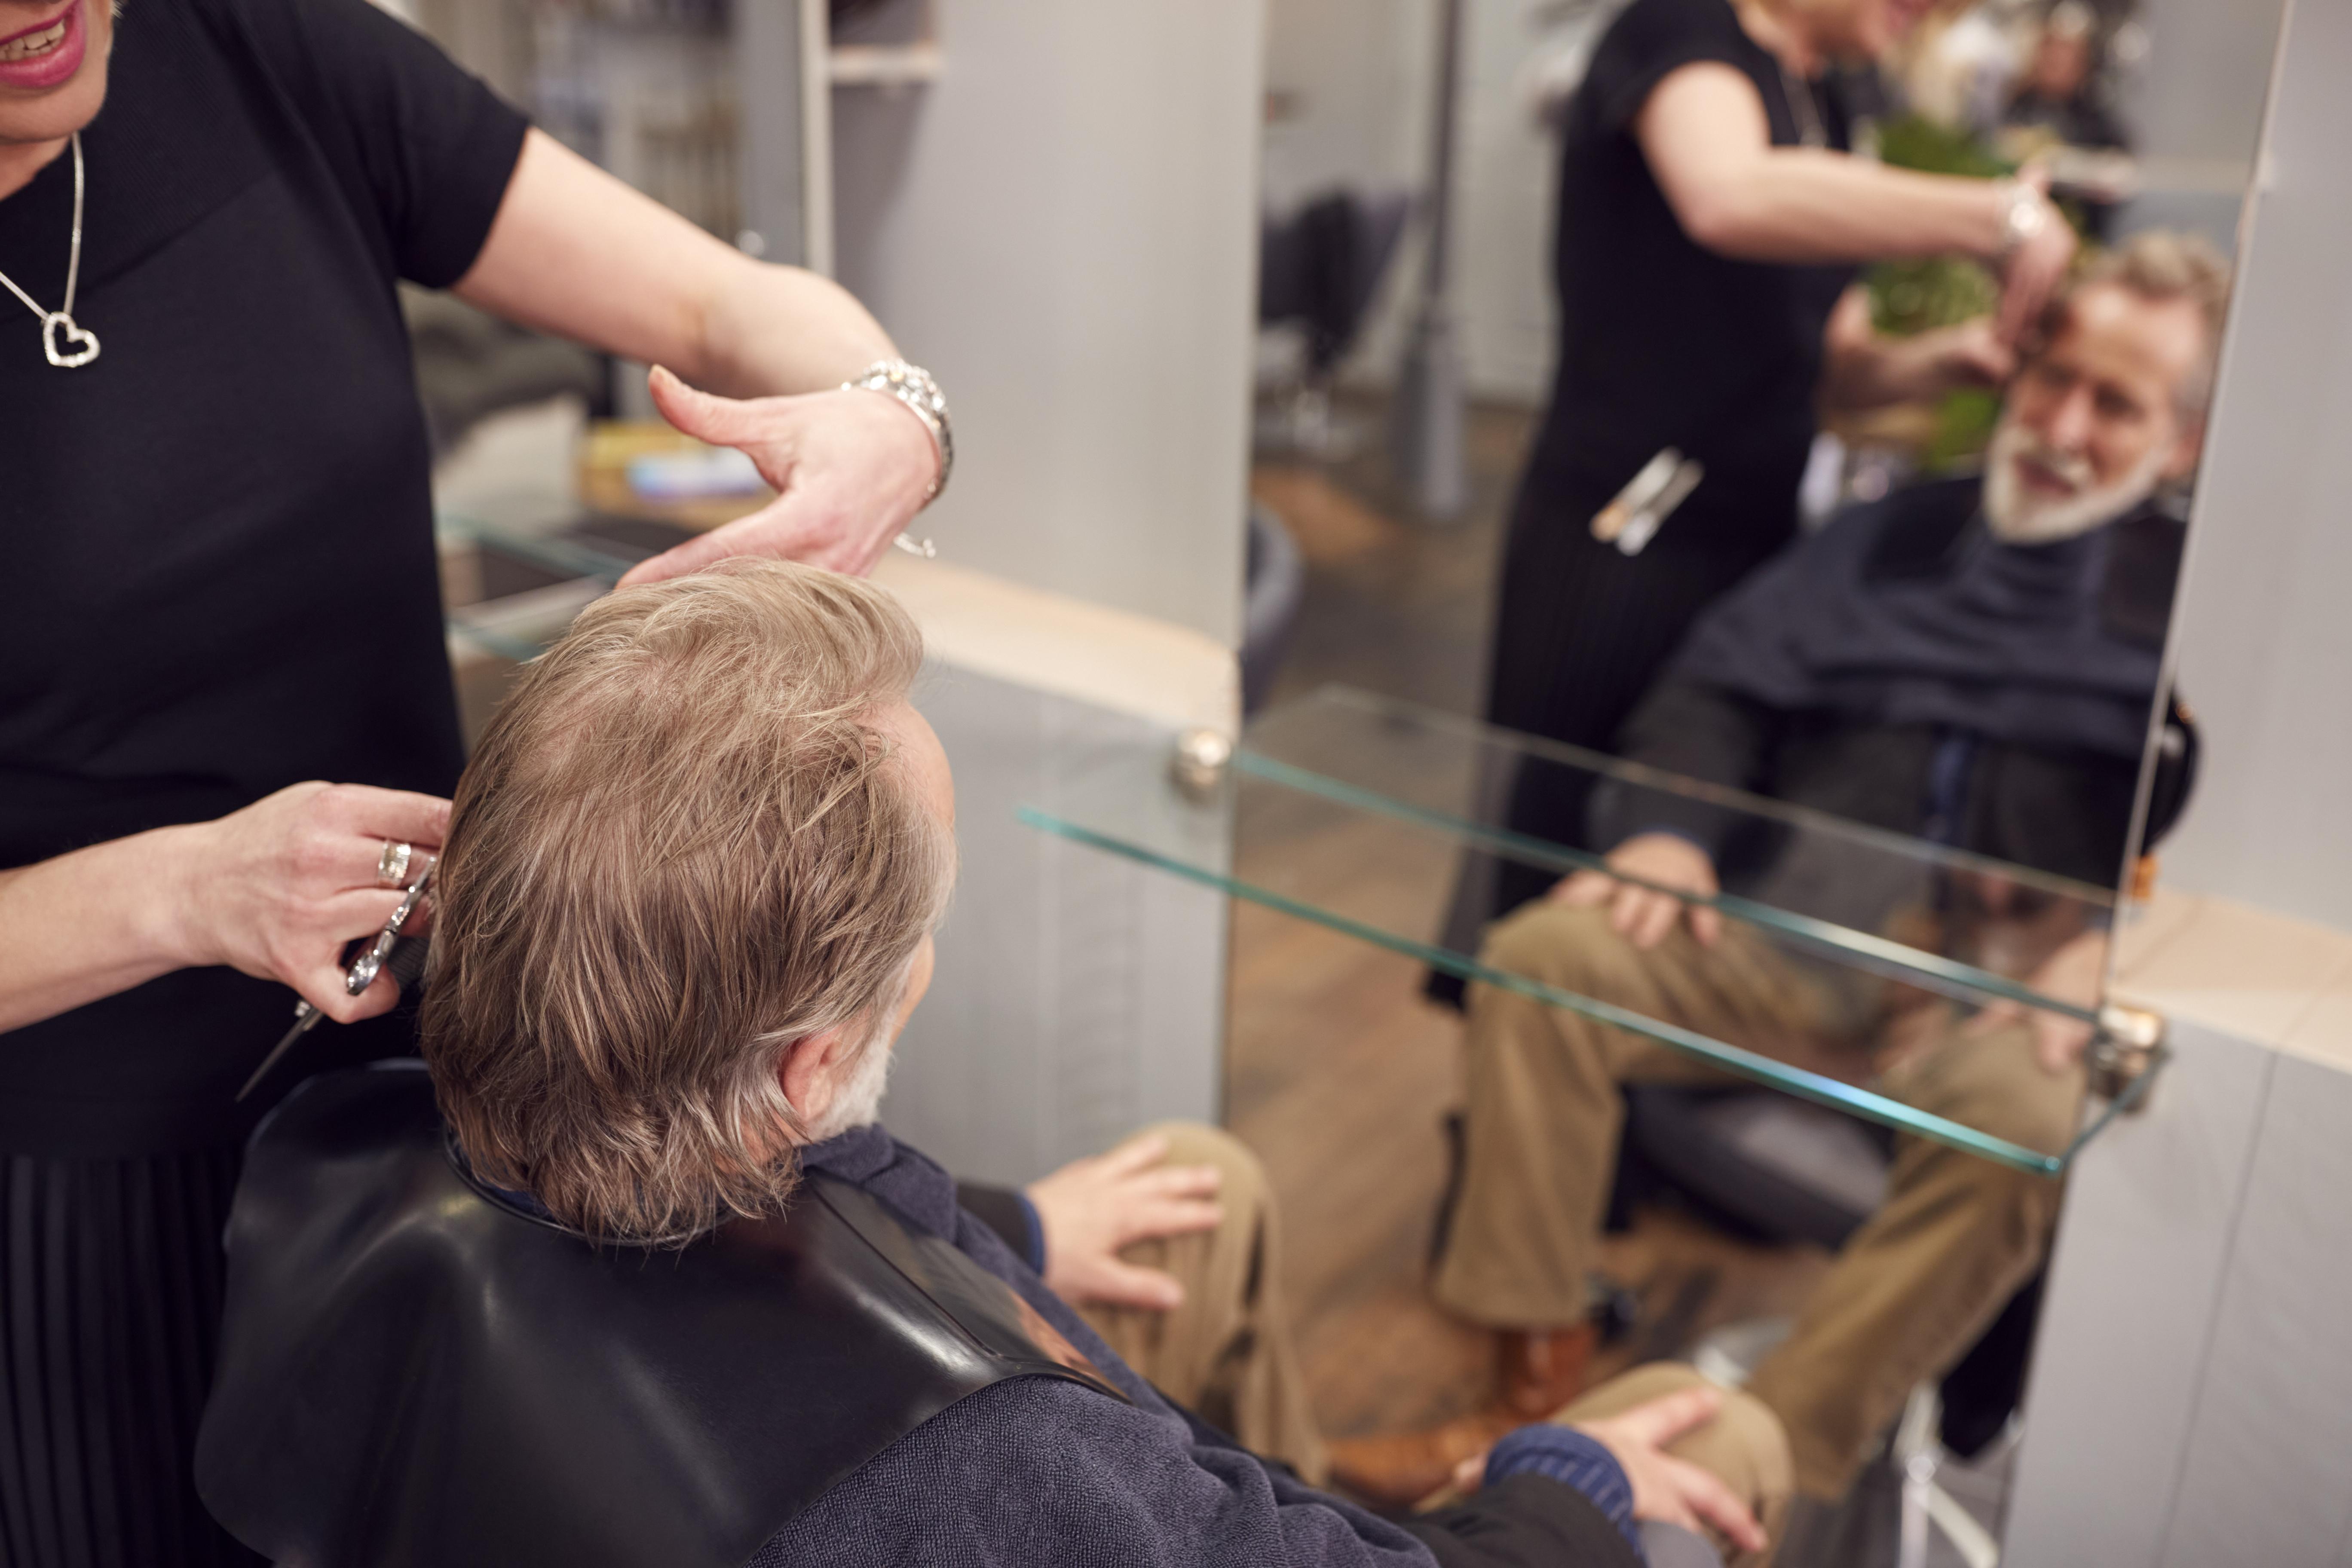 Senior Man Having Hair Cut By Female Stylist In Hairdressing Salon